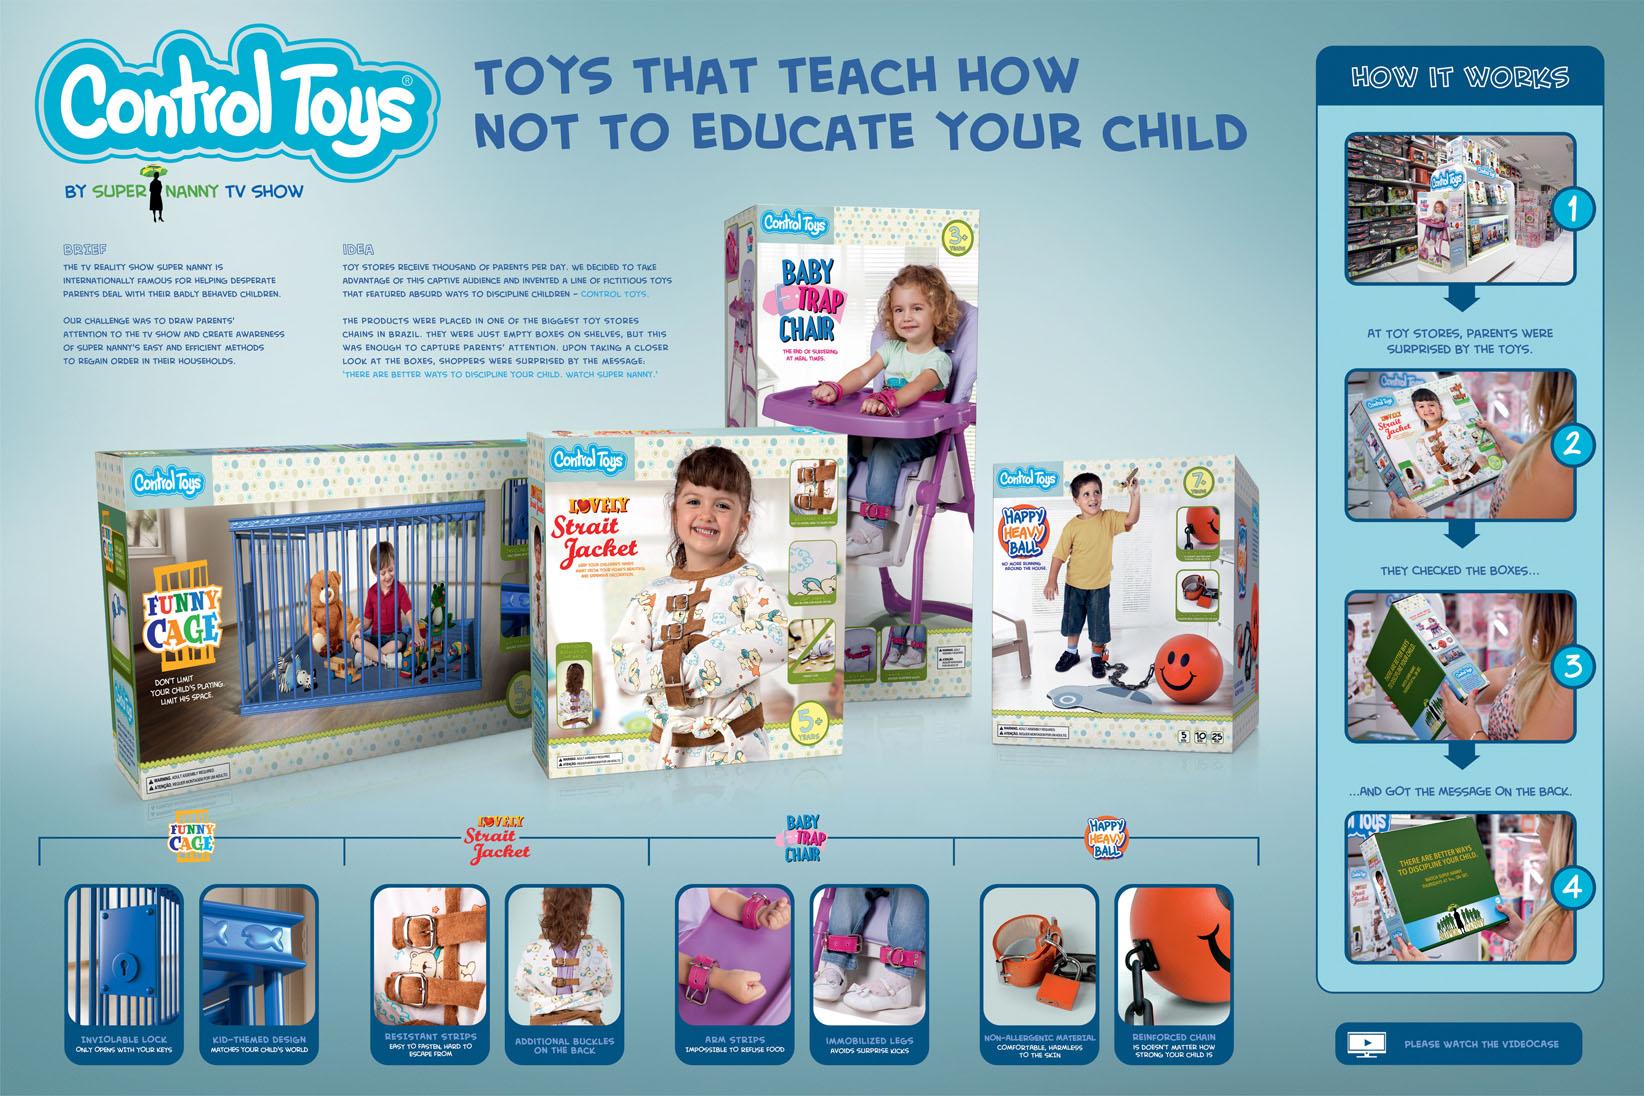 Control Toys